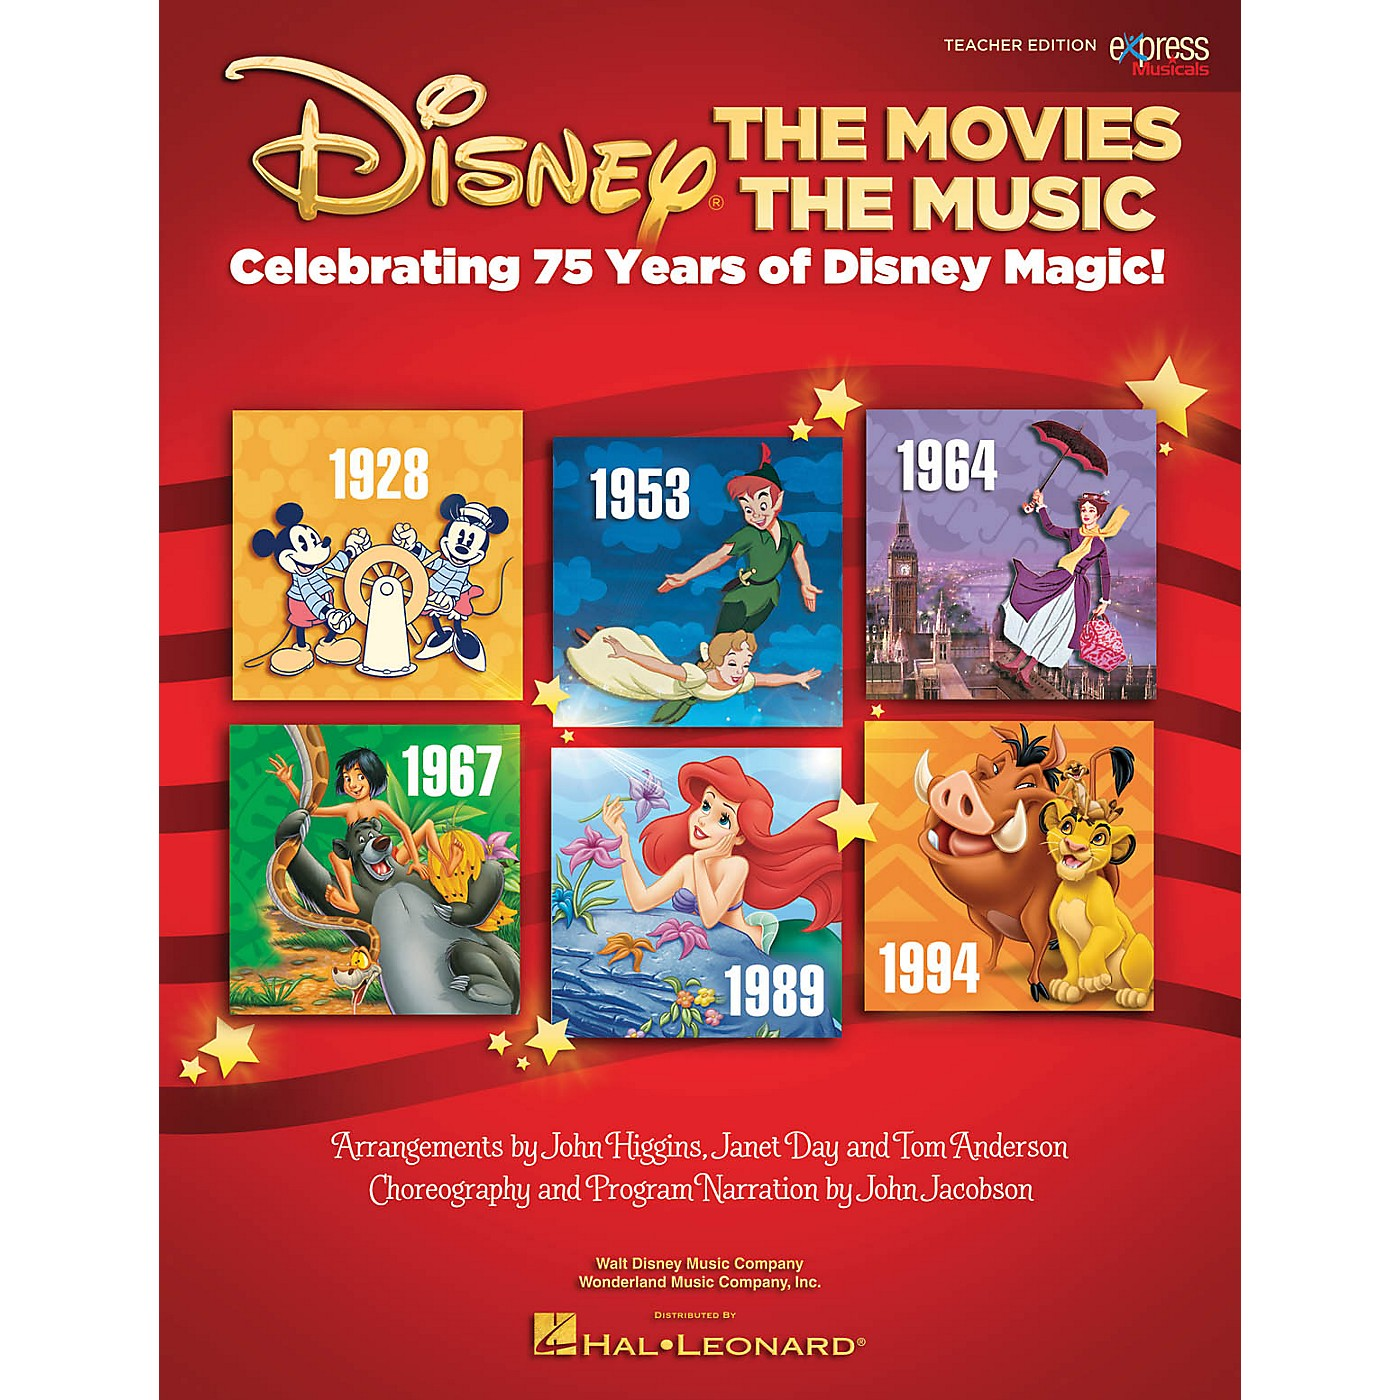 Hal Leonard Disney: The Movies The Music (Celebrating 75 Years of Disney Magic!) singer 20 pak by John Higgins thumbnail